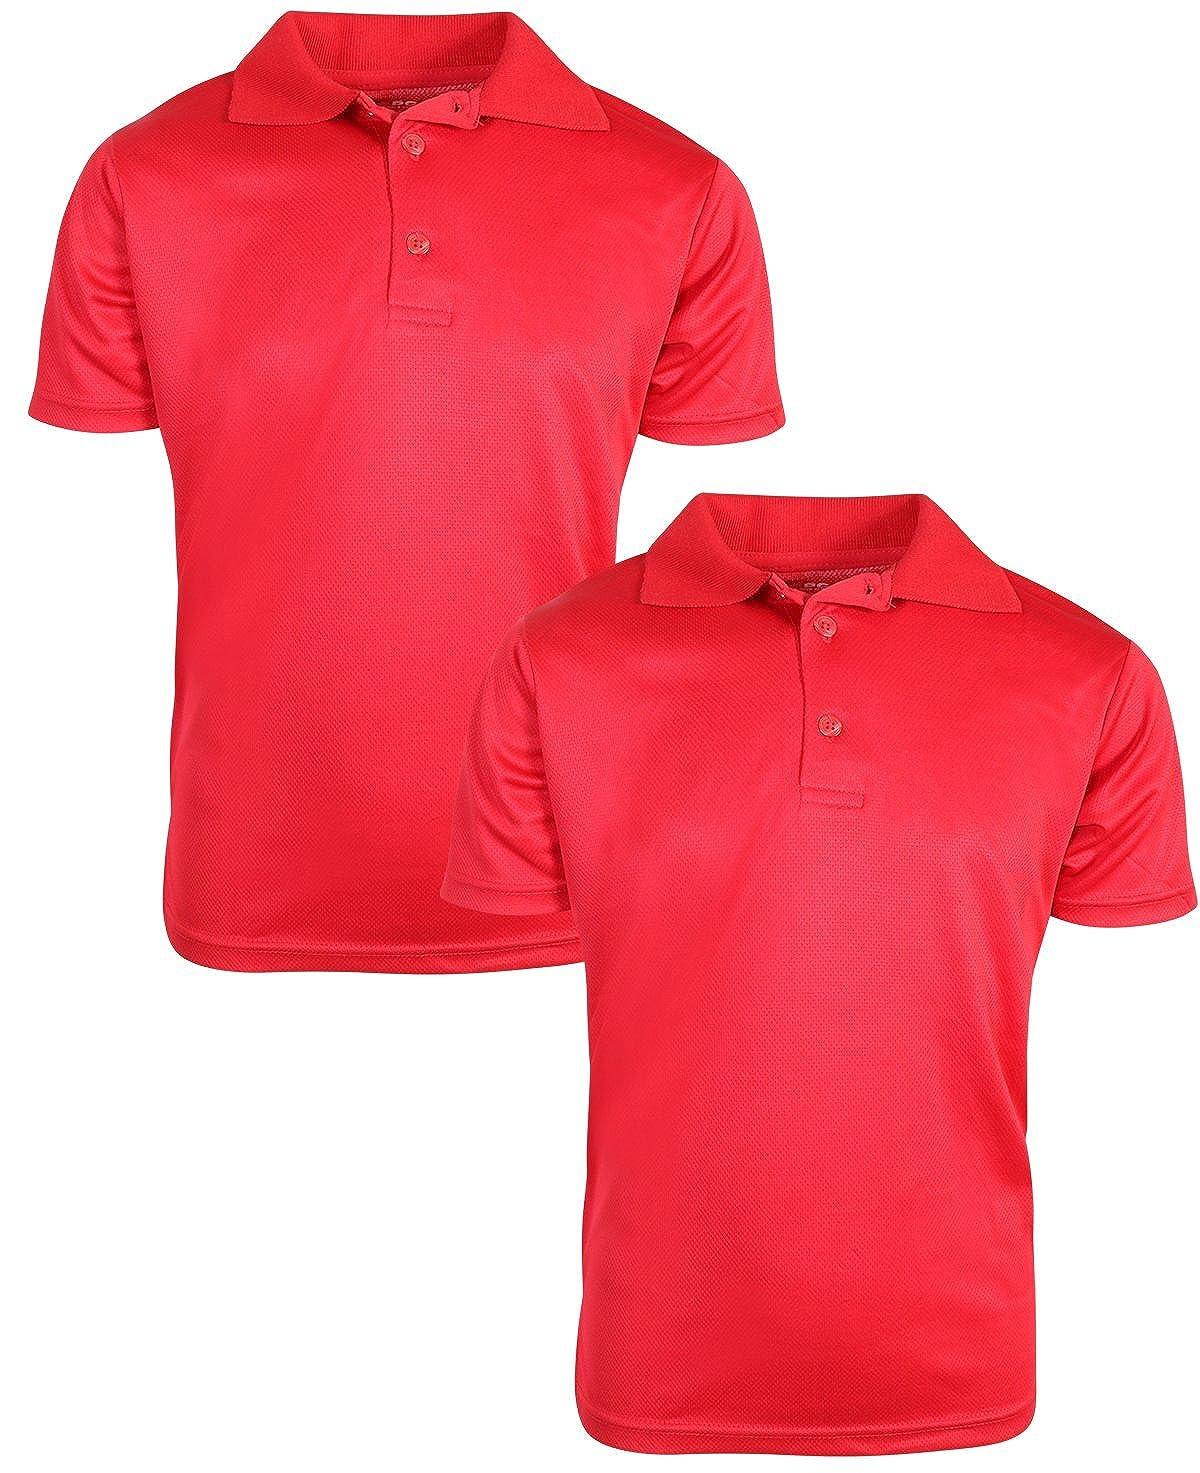 BHS Blue Boys school uniform shirt 2 x pack shirts NEW diff sizes